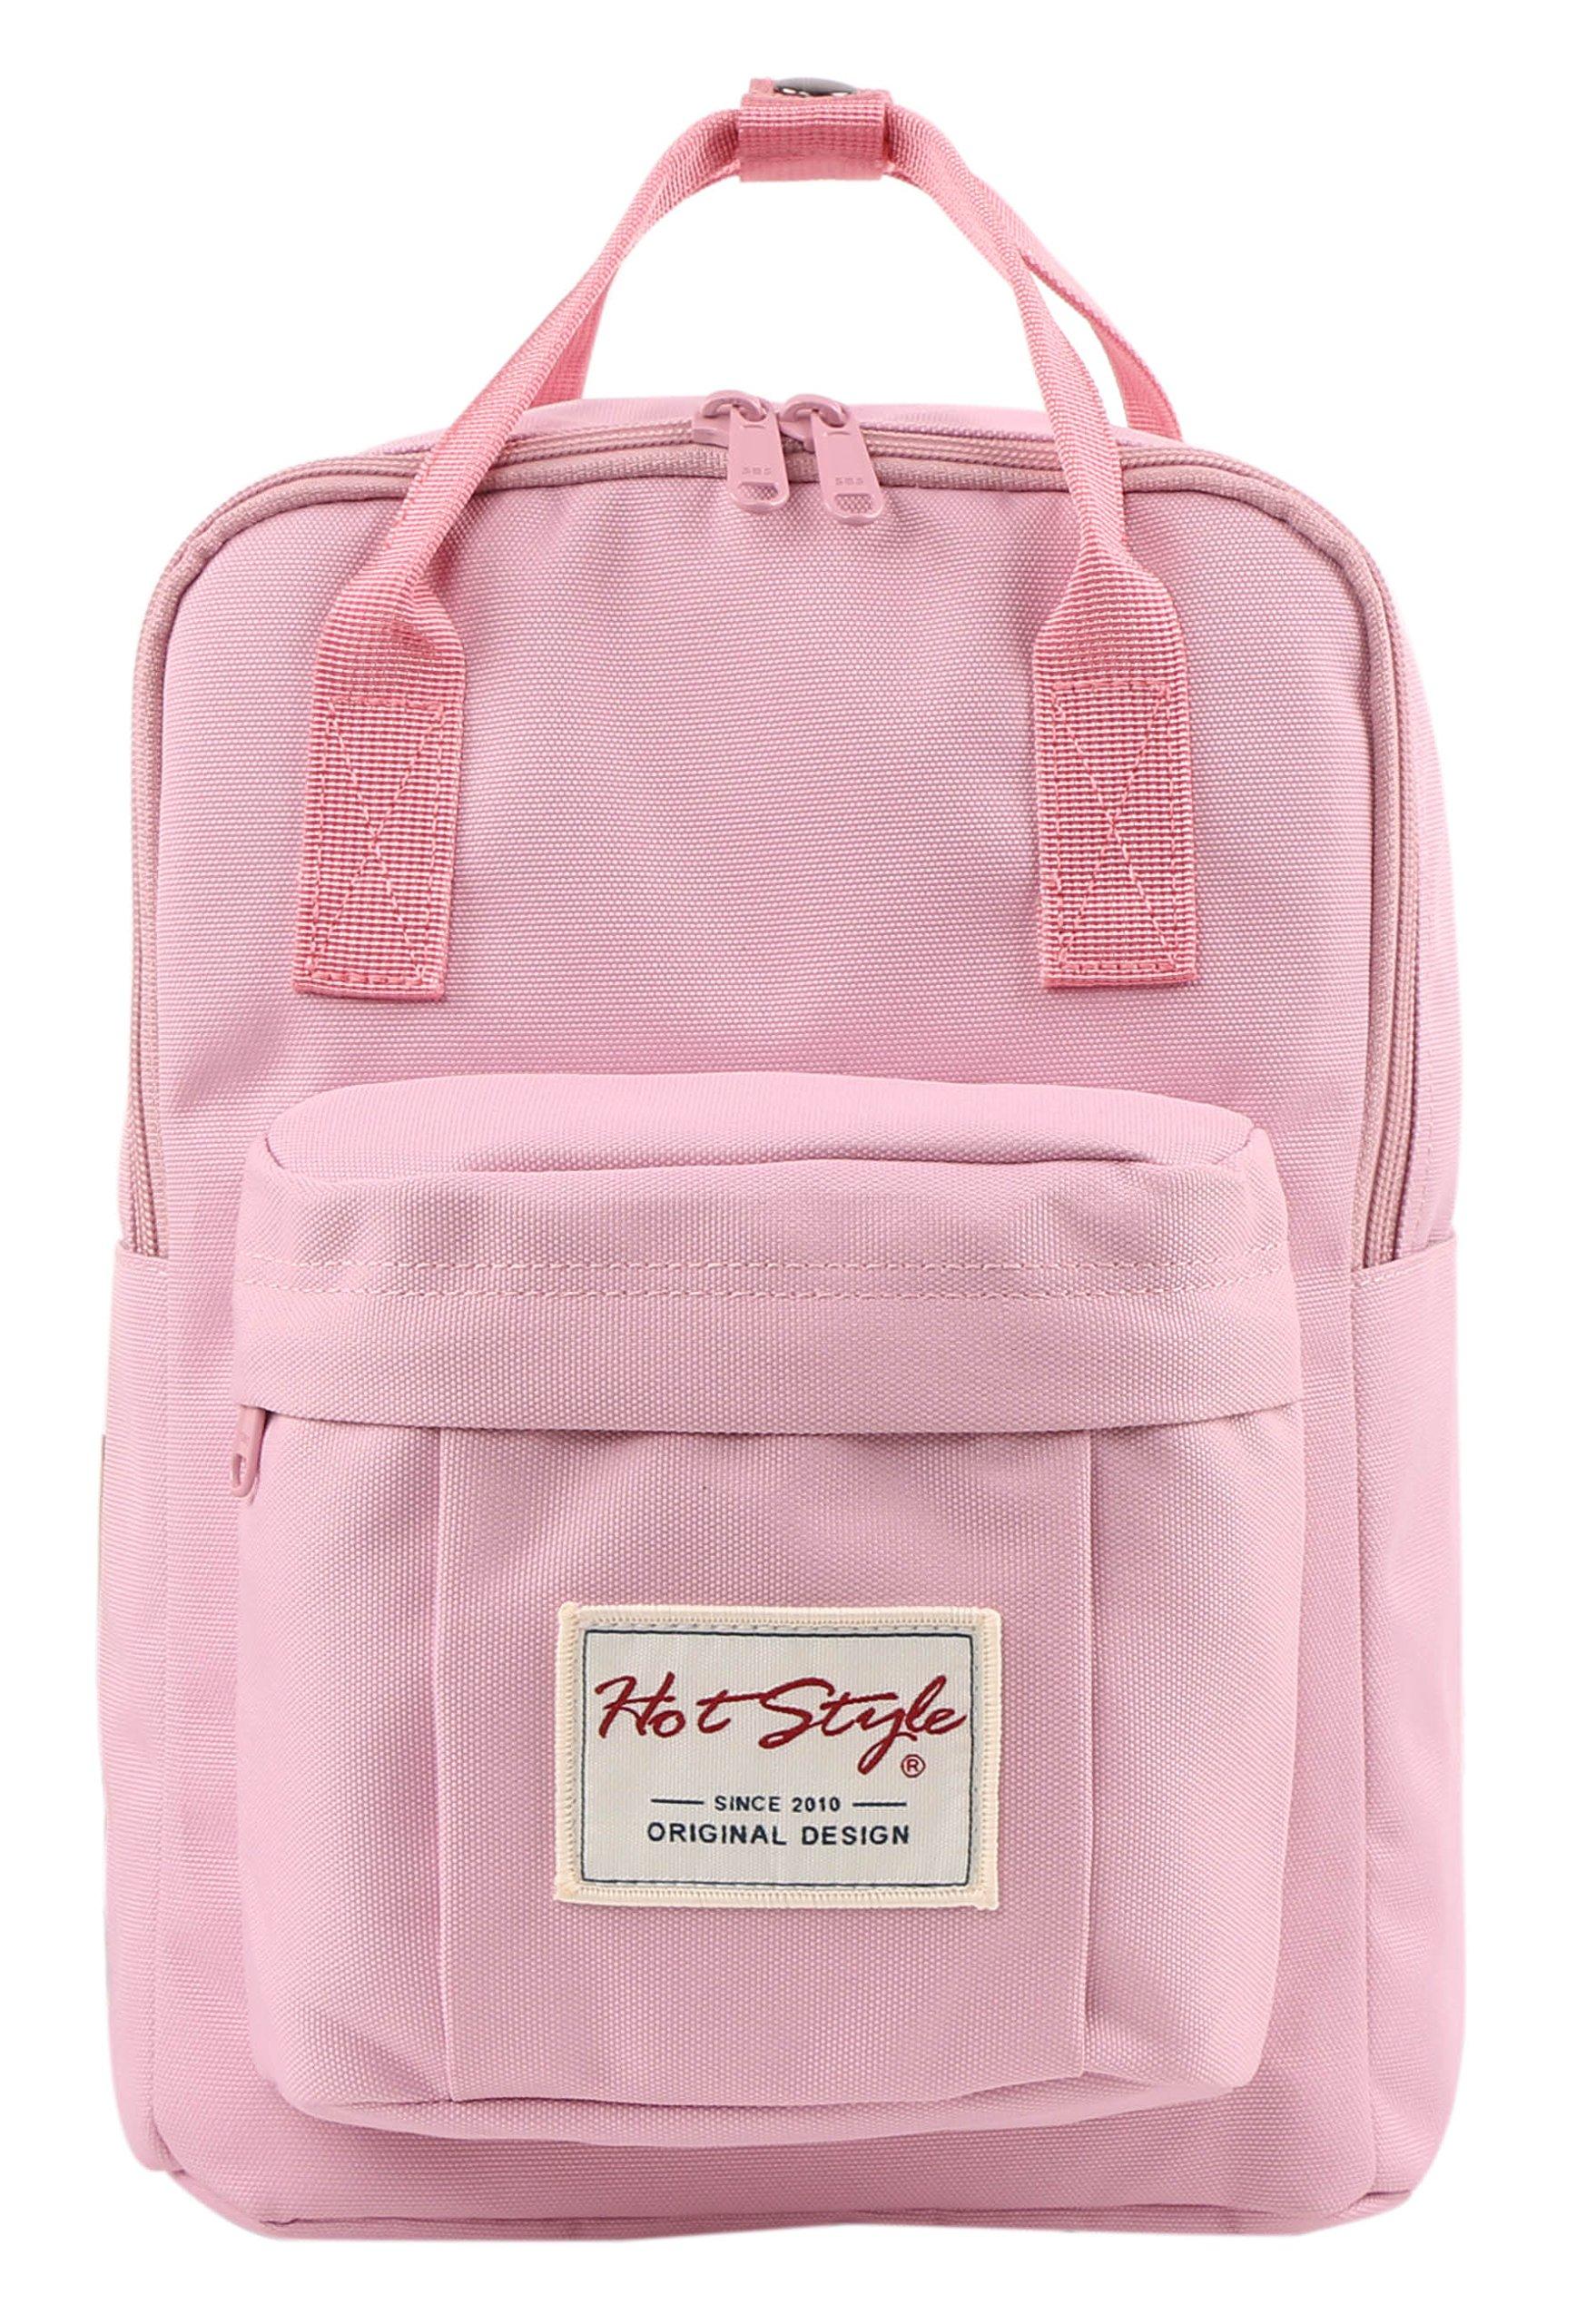 BESTIE 12'' Cute Mini Small Backpack Purse Travel Bag - Pink